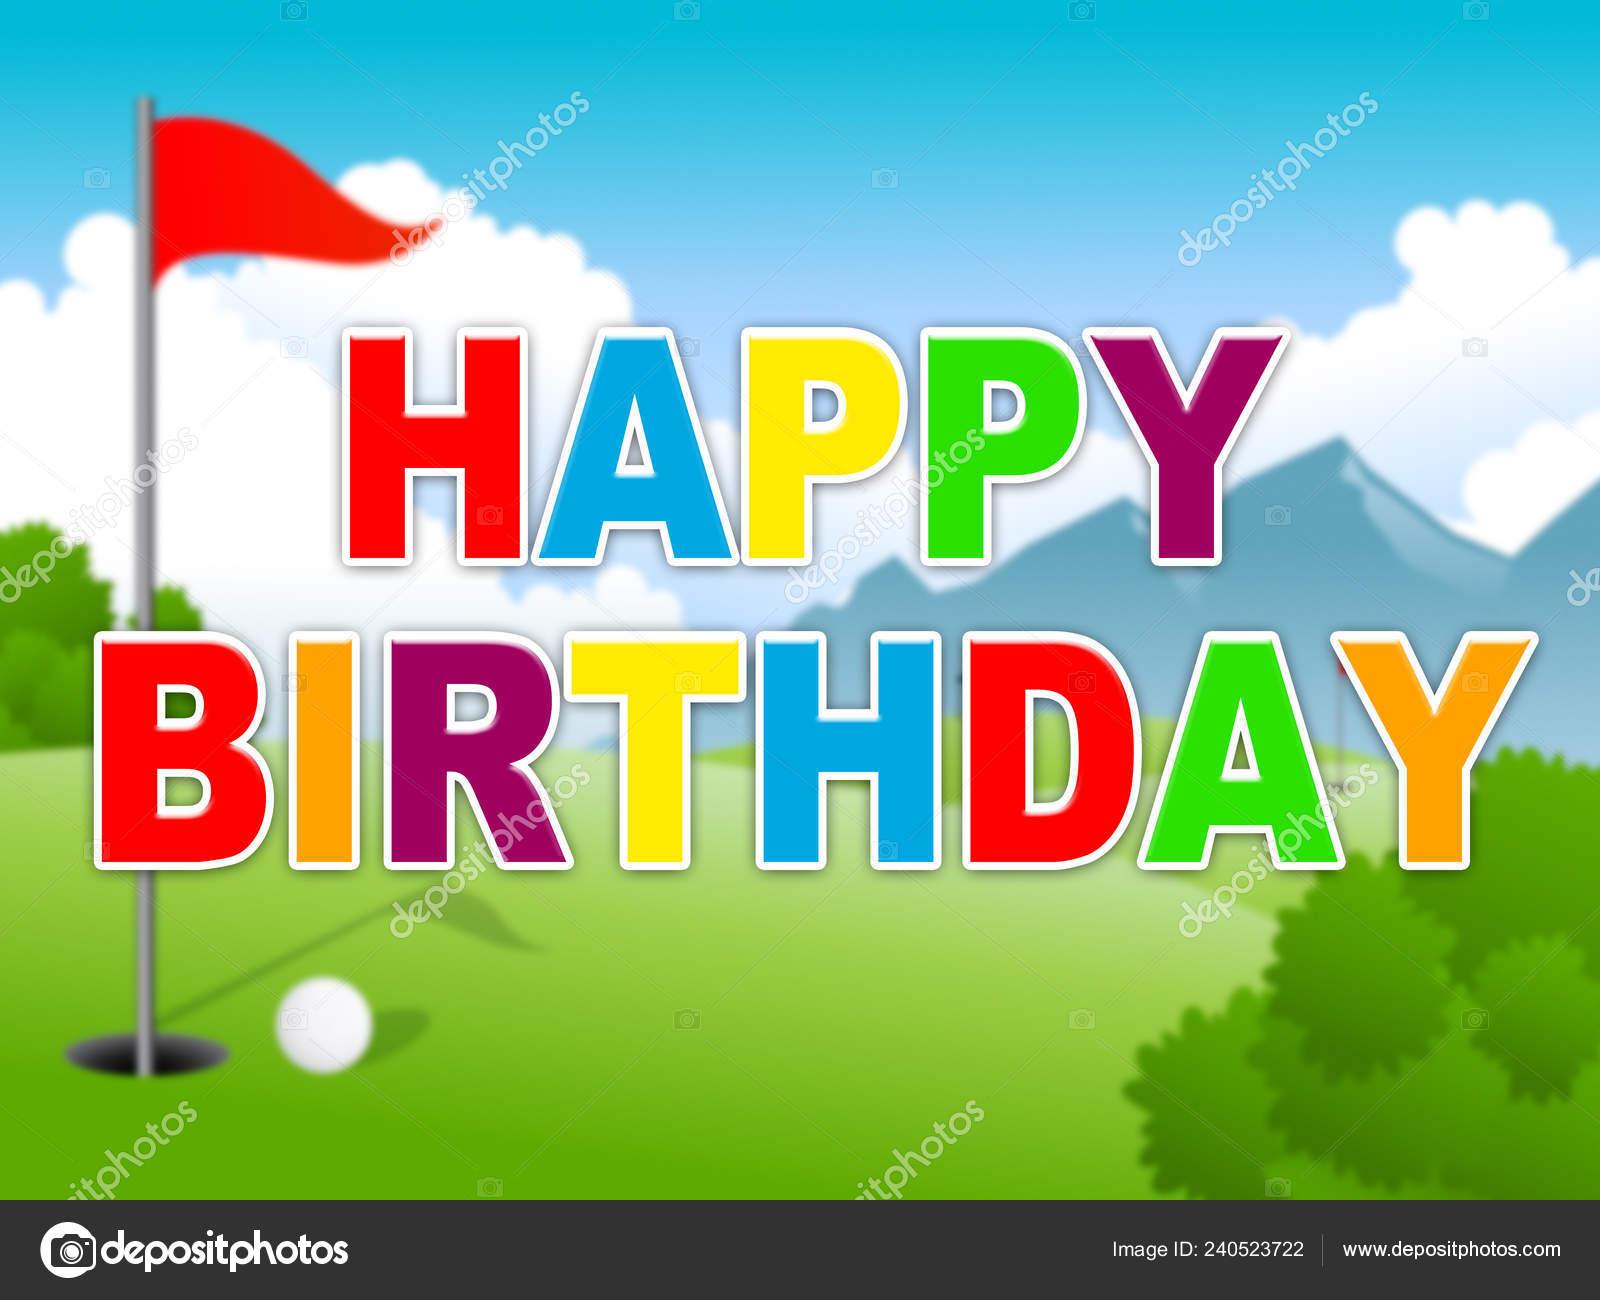 Happy Birthday Golfing Message Surprise Greeting Golfer Congrats Golf Fanatic Stock Photo Image By C Stuartmiles 240523722